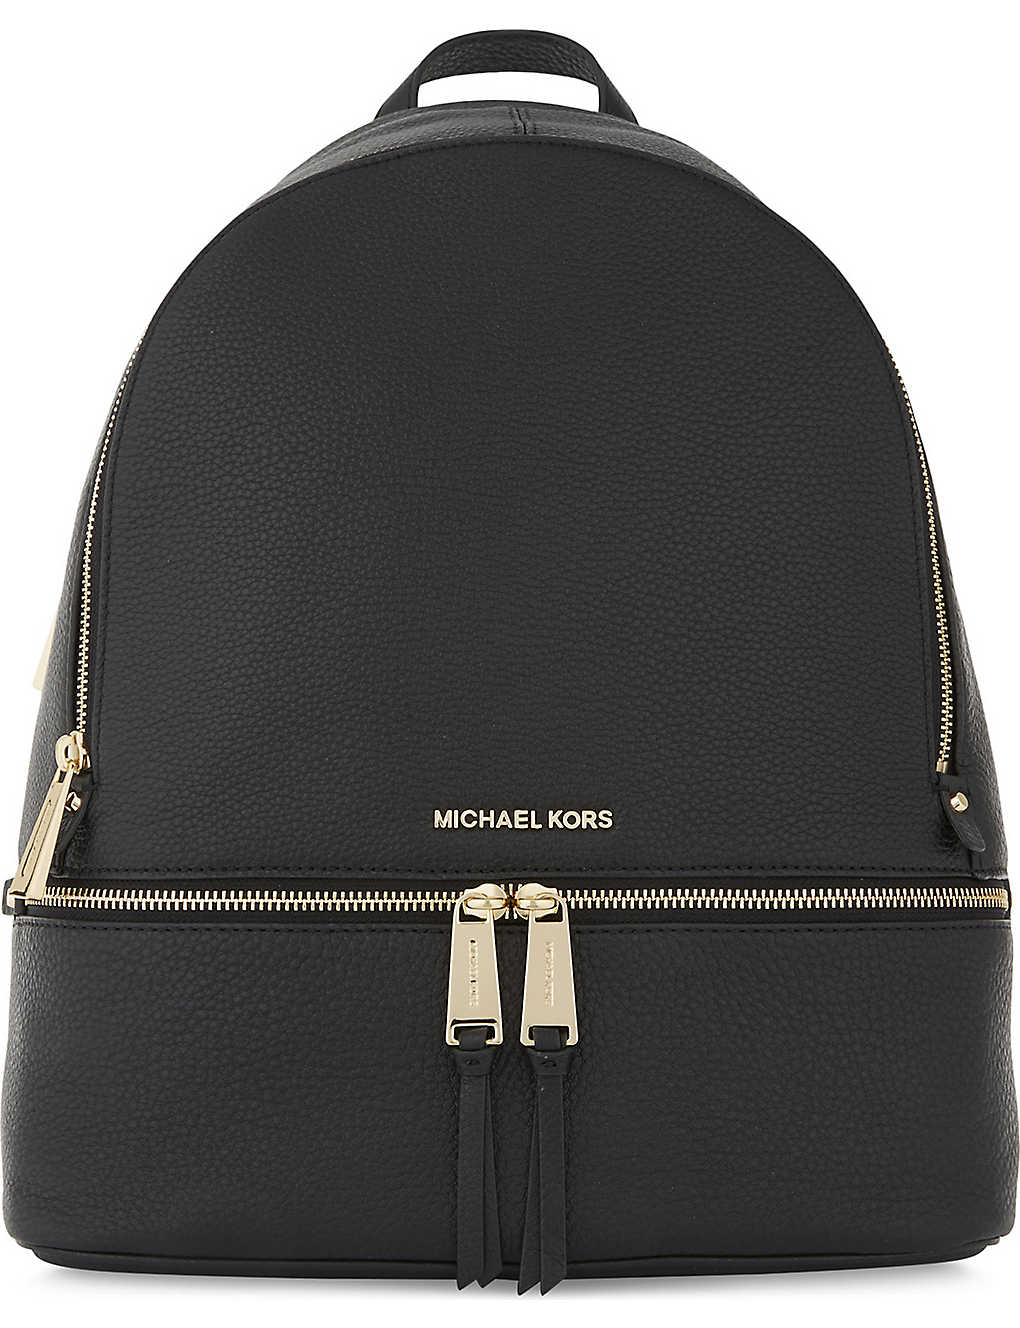 db3edc212909 MICHAEL MICHAEL KORS - Rhea large grained leather backpack ...